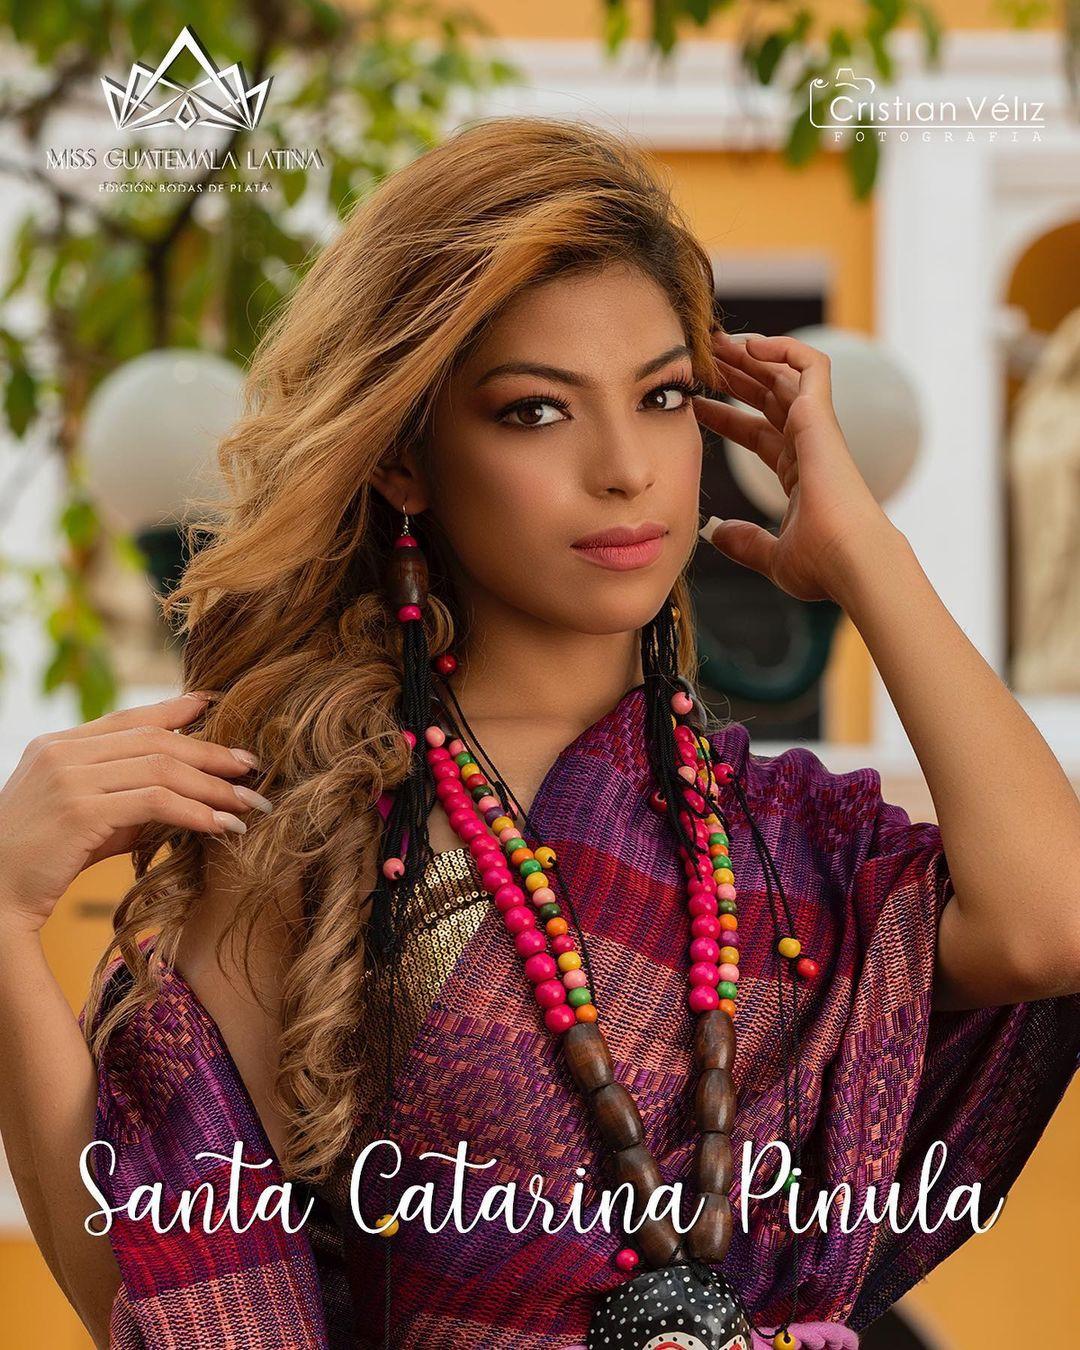 candidatas a miss guatemala latina 2021. final: 30 de abril. - Página 3 B2rHT7